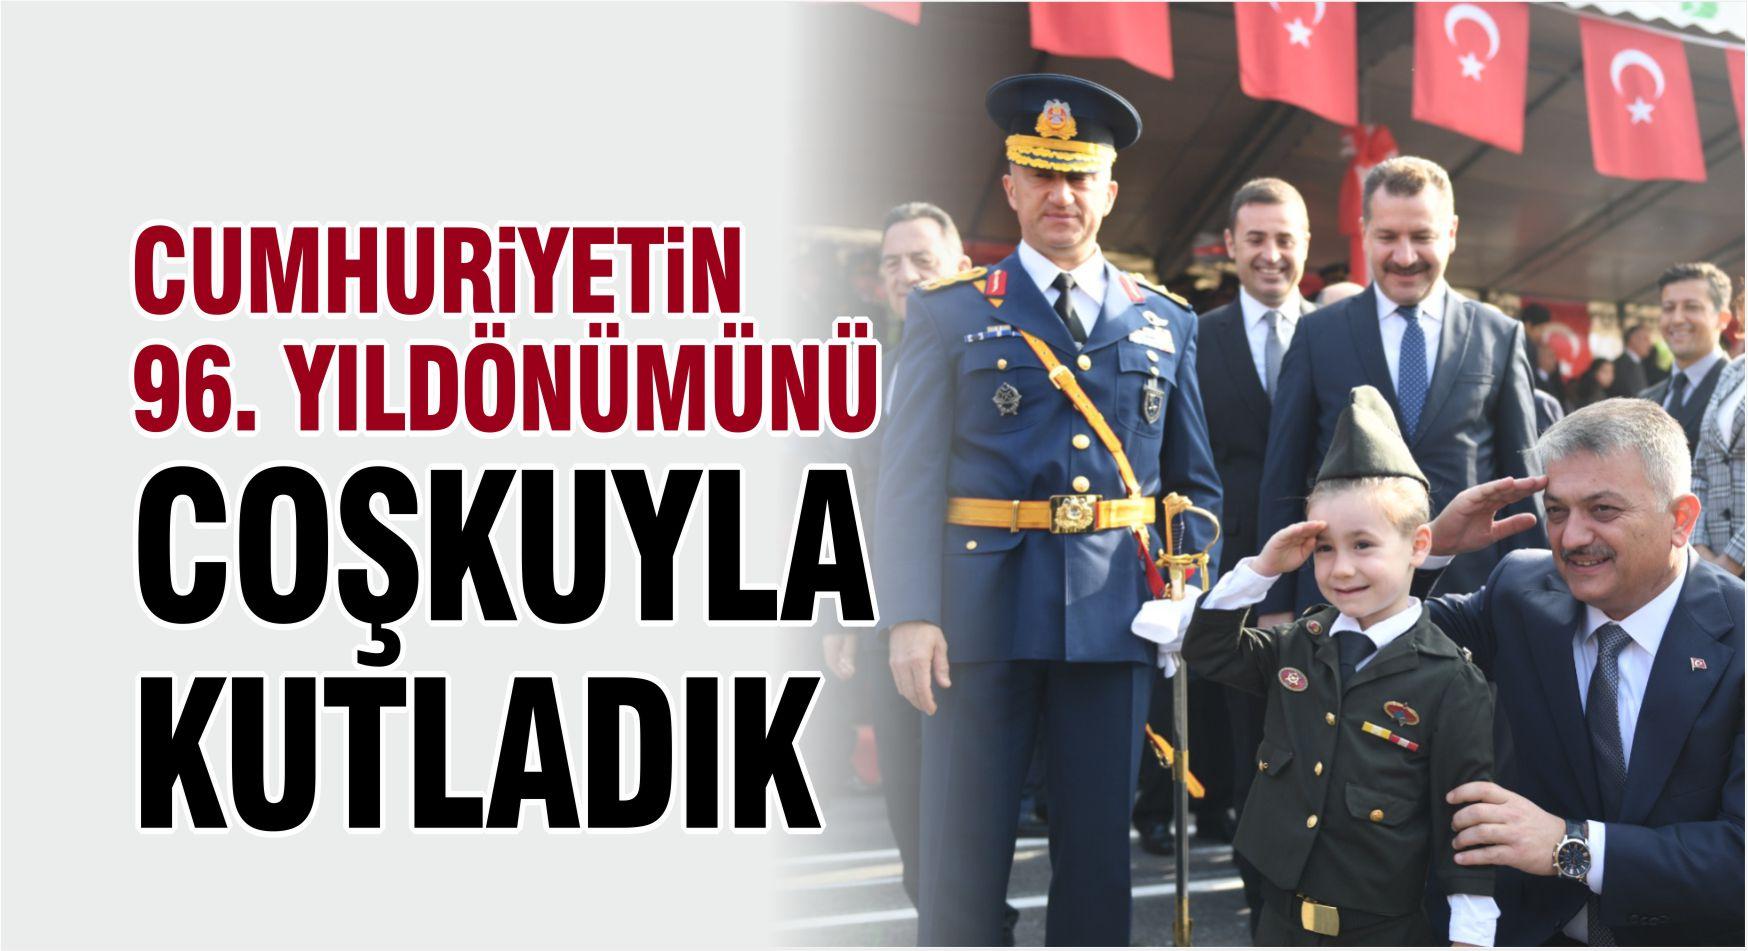 BALIKESİR'DE CUMHURİYET BAYRAMI KUTLAMALARI